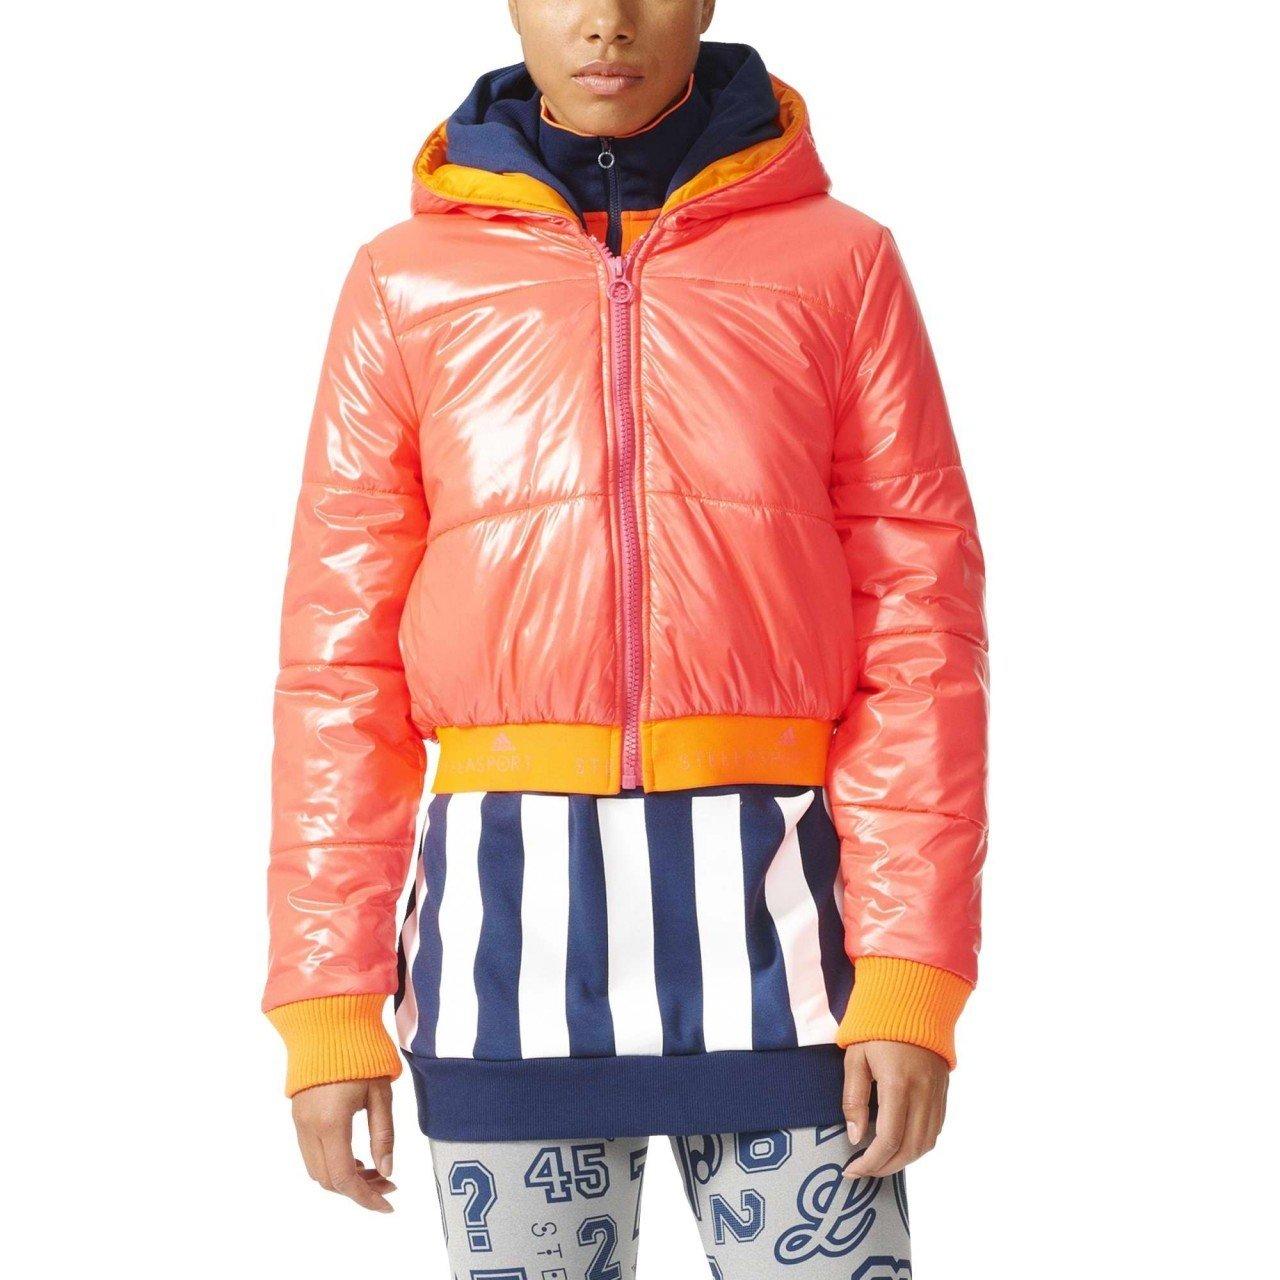 adidas stellasport(by Stella McCartney) warm puffer jacket